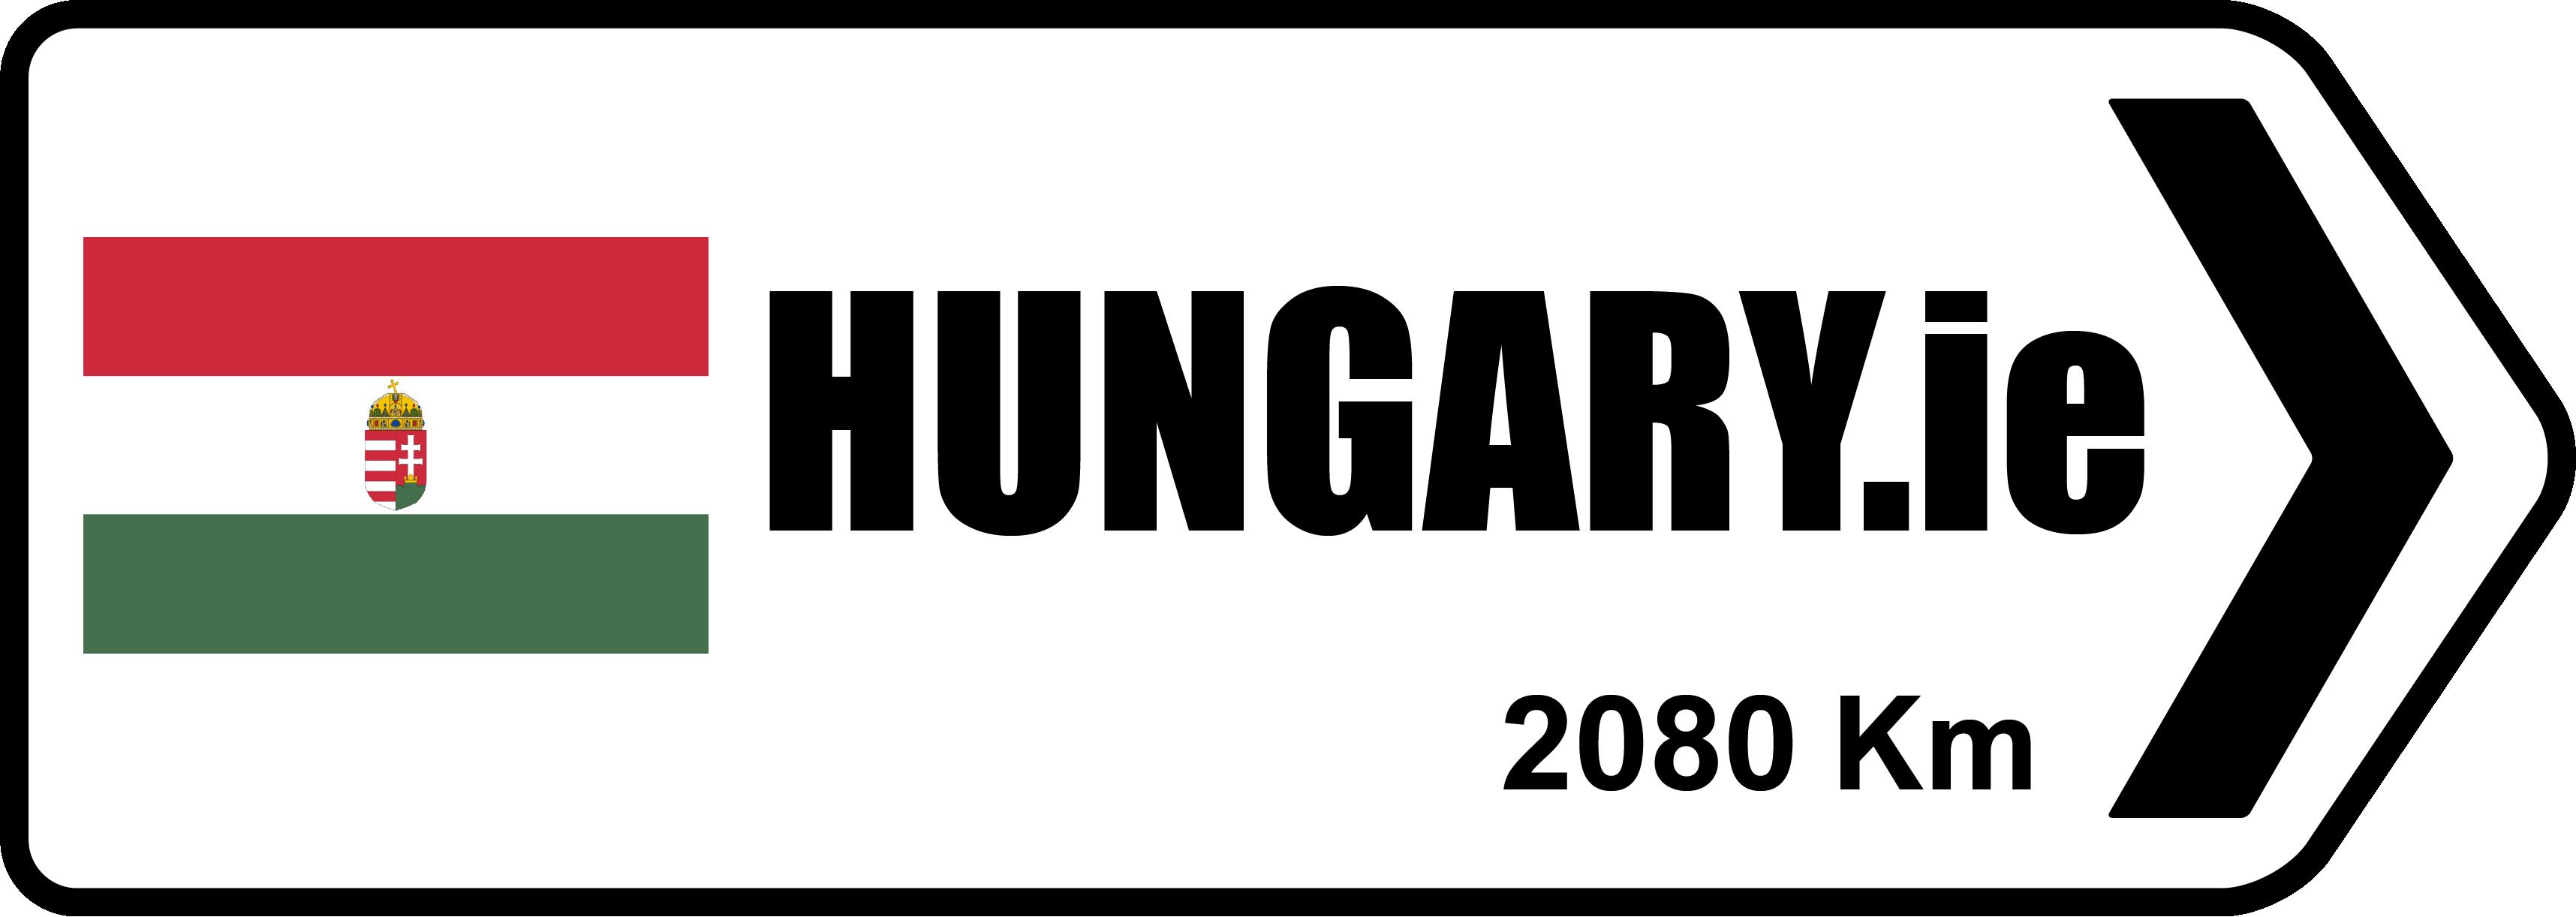 Visit Hungary from Ireland